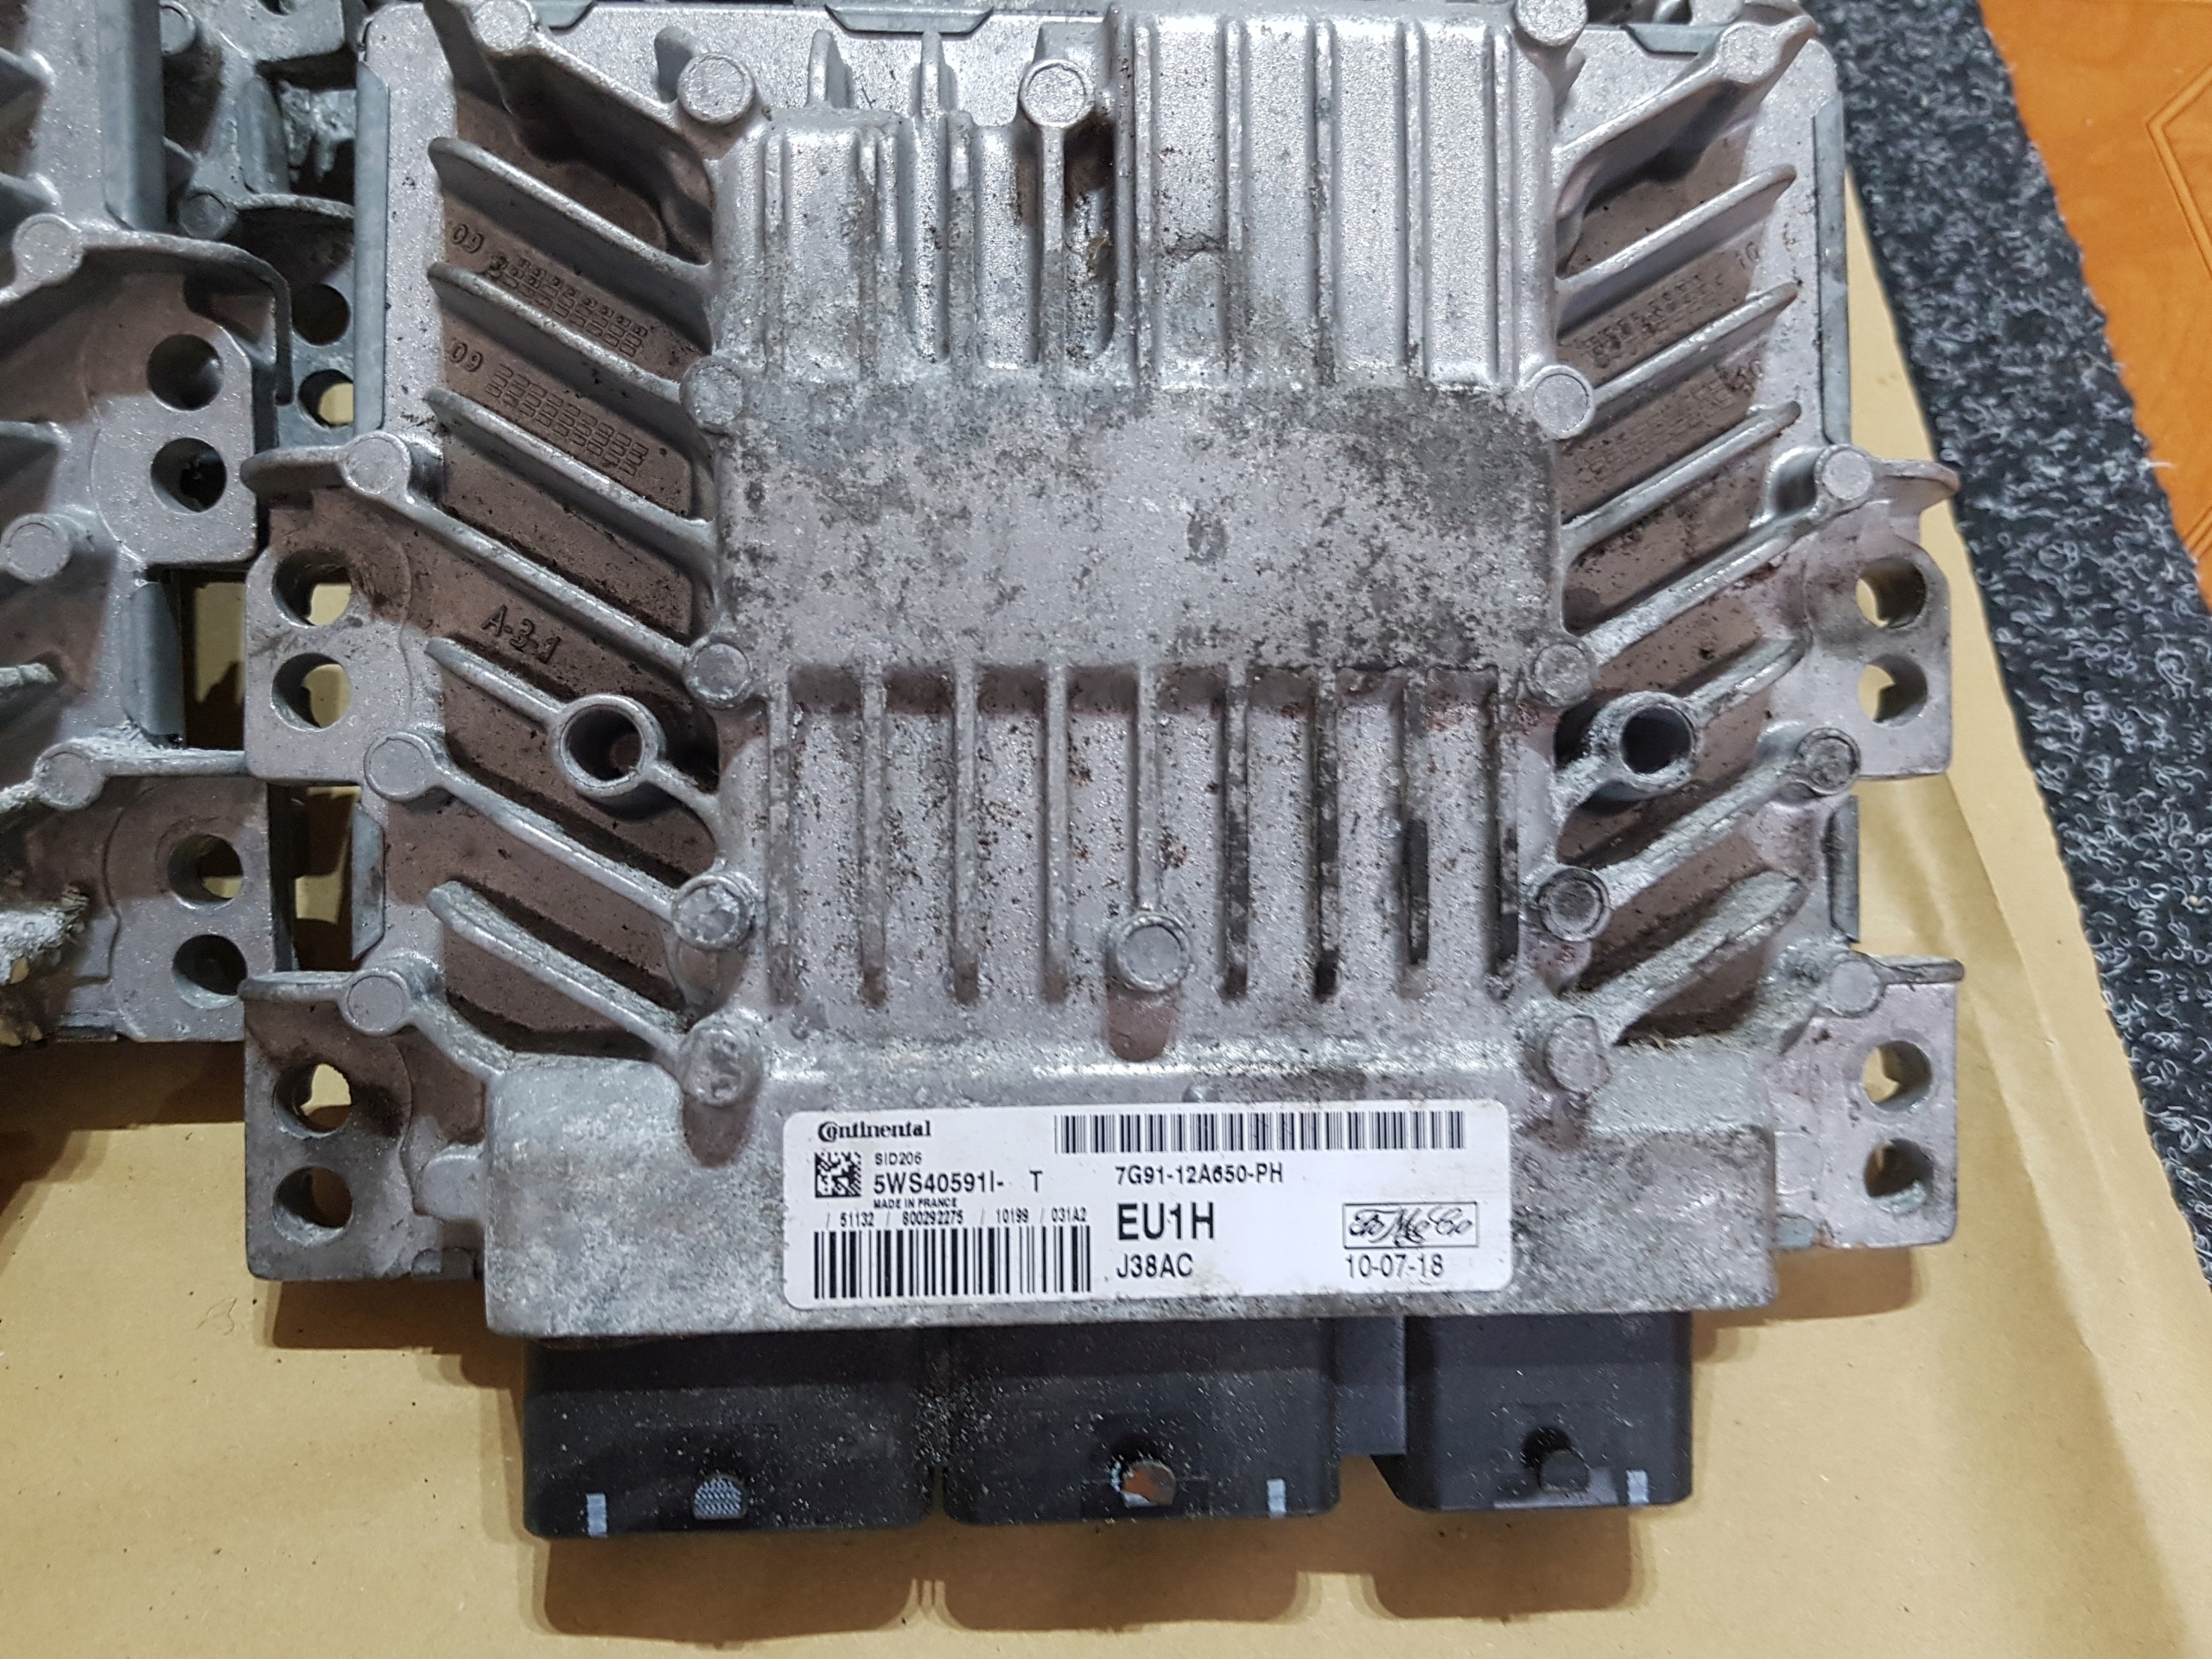 компьютер двигателя mondeo mk4 18 7g91-12a650-ph